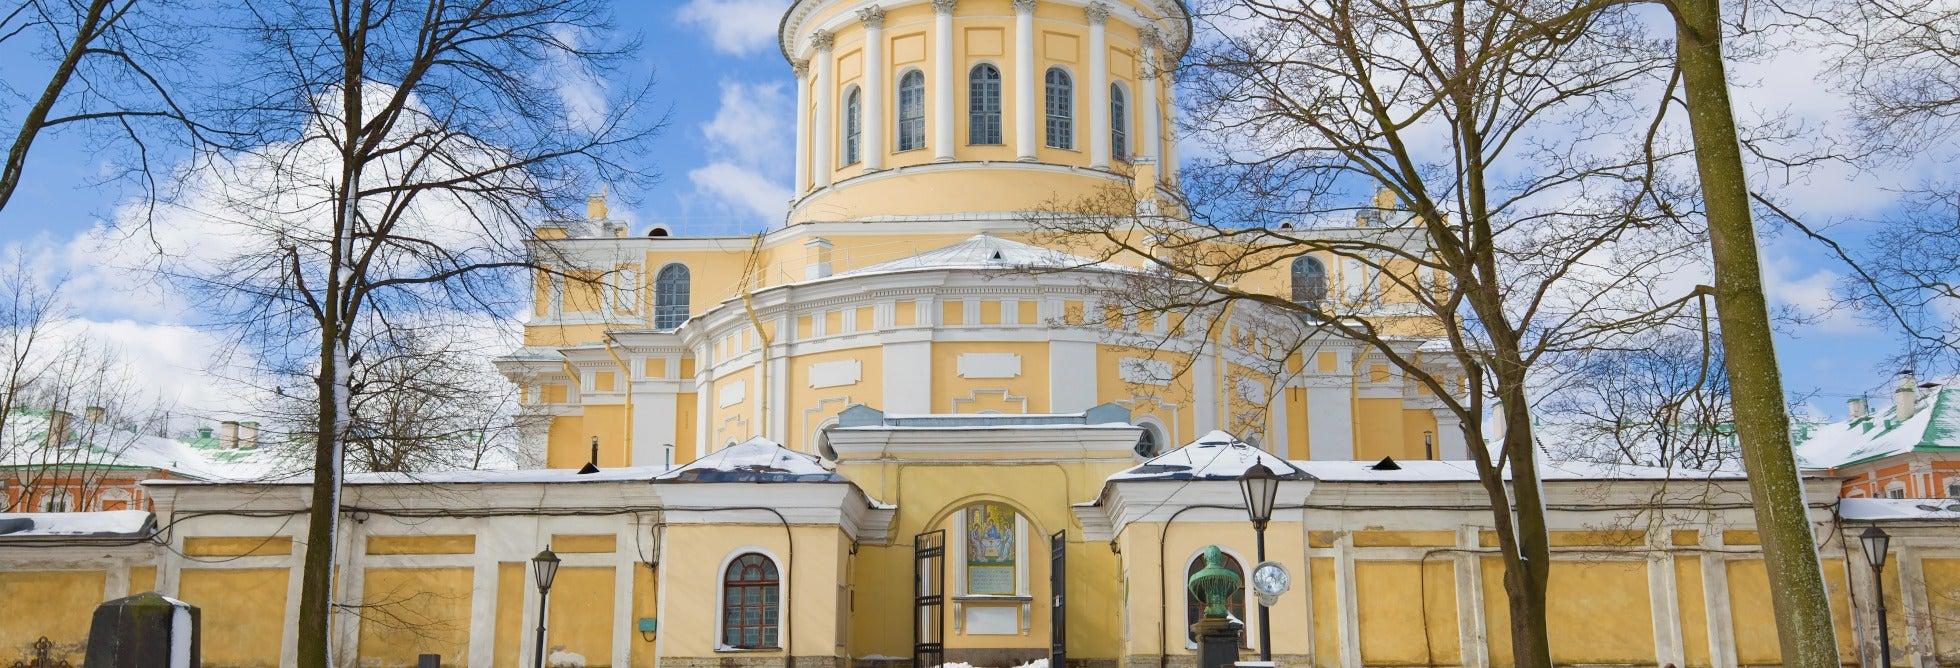 Tour del monastero di Aleksandr Nevskij e tomba di Dostoevskij